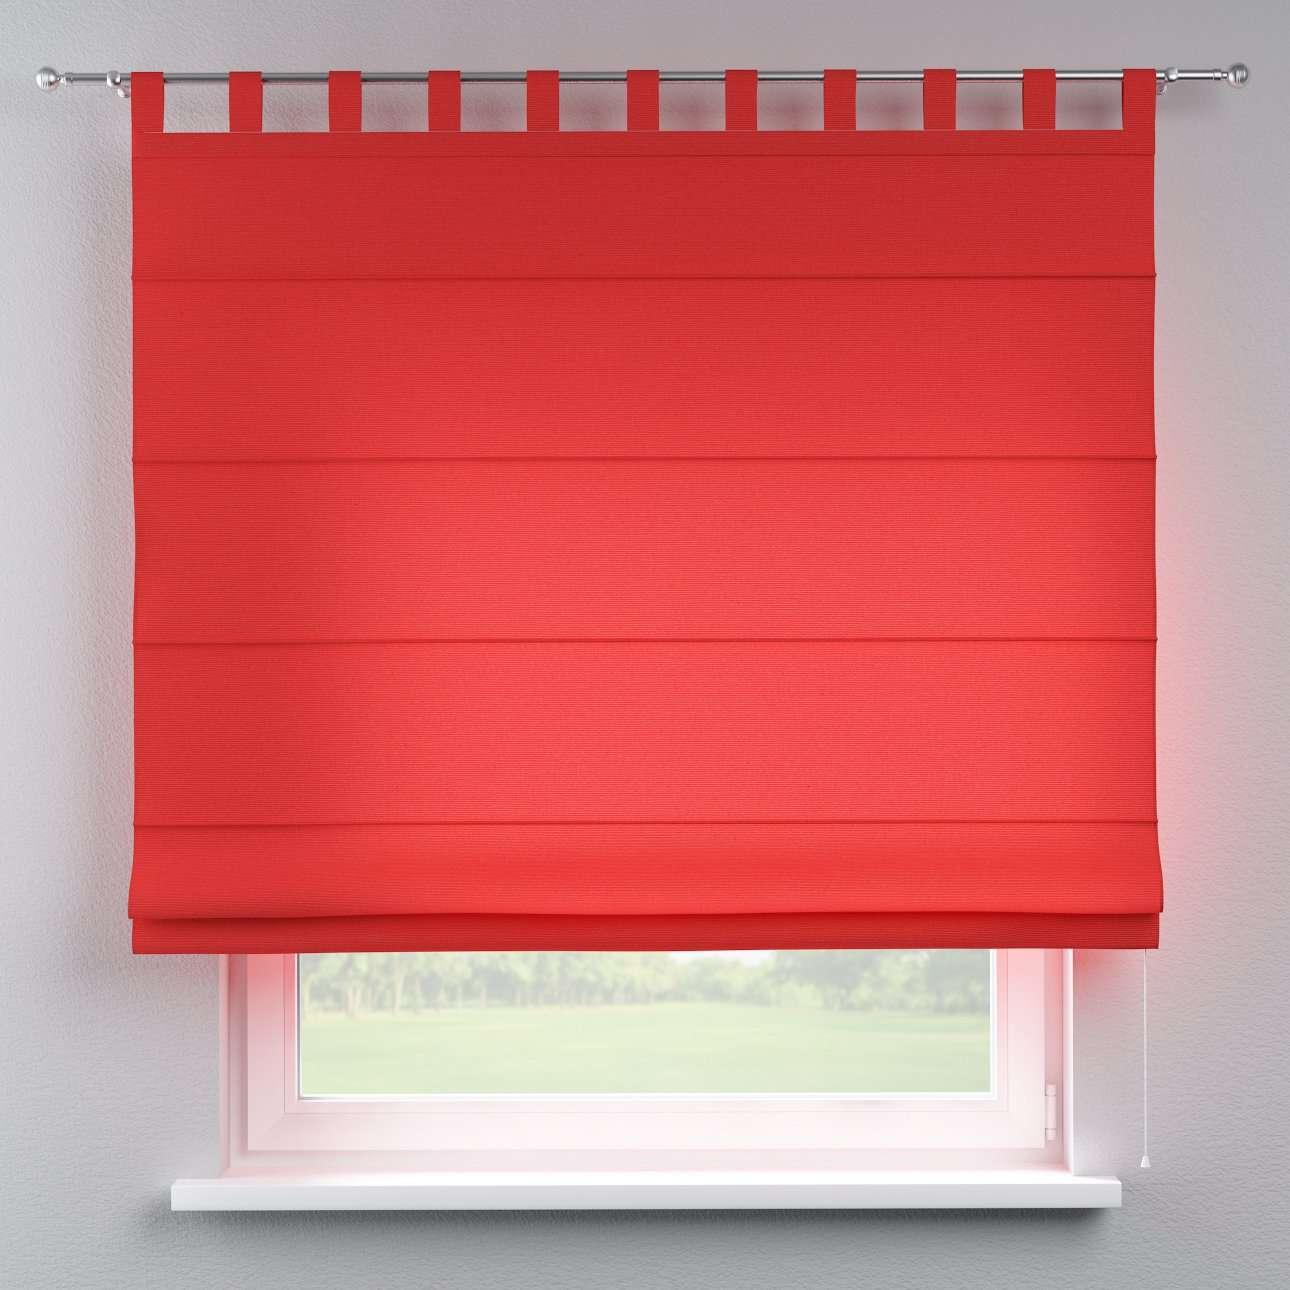 Foldegardin Verona<br/>Med stropper til gardinstang 80 x 170 cm fra kollektionen Loneta, Stof: 133-43